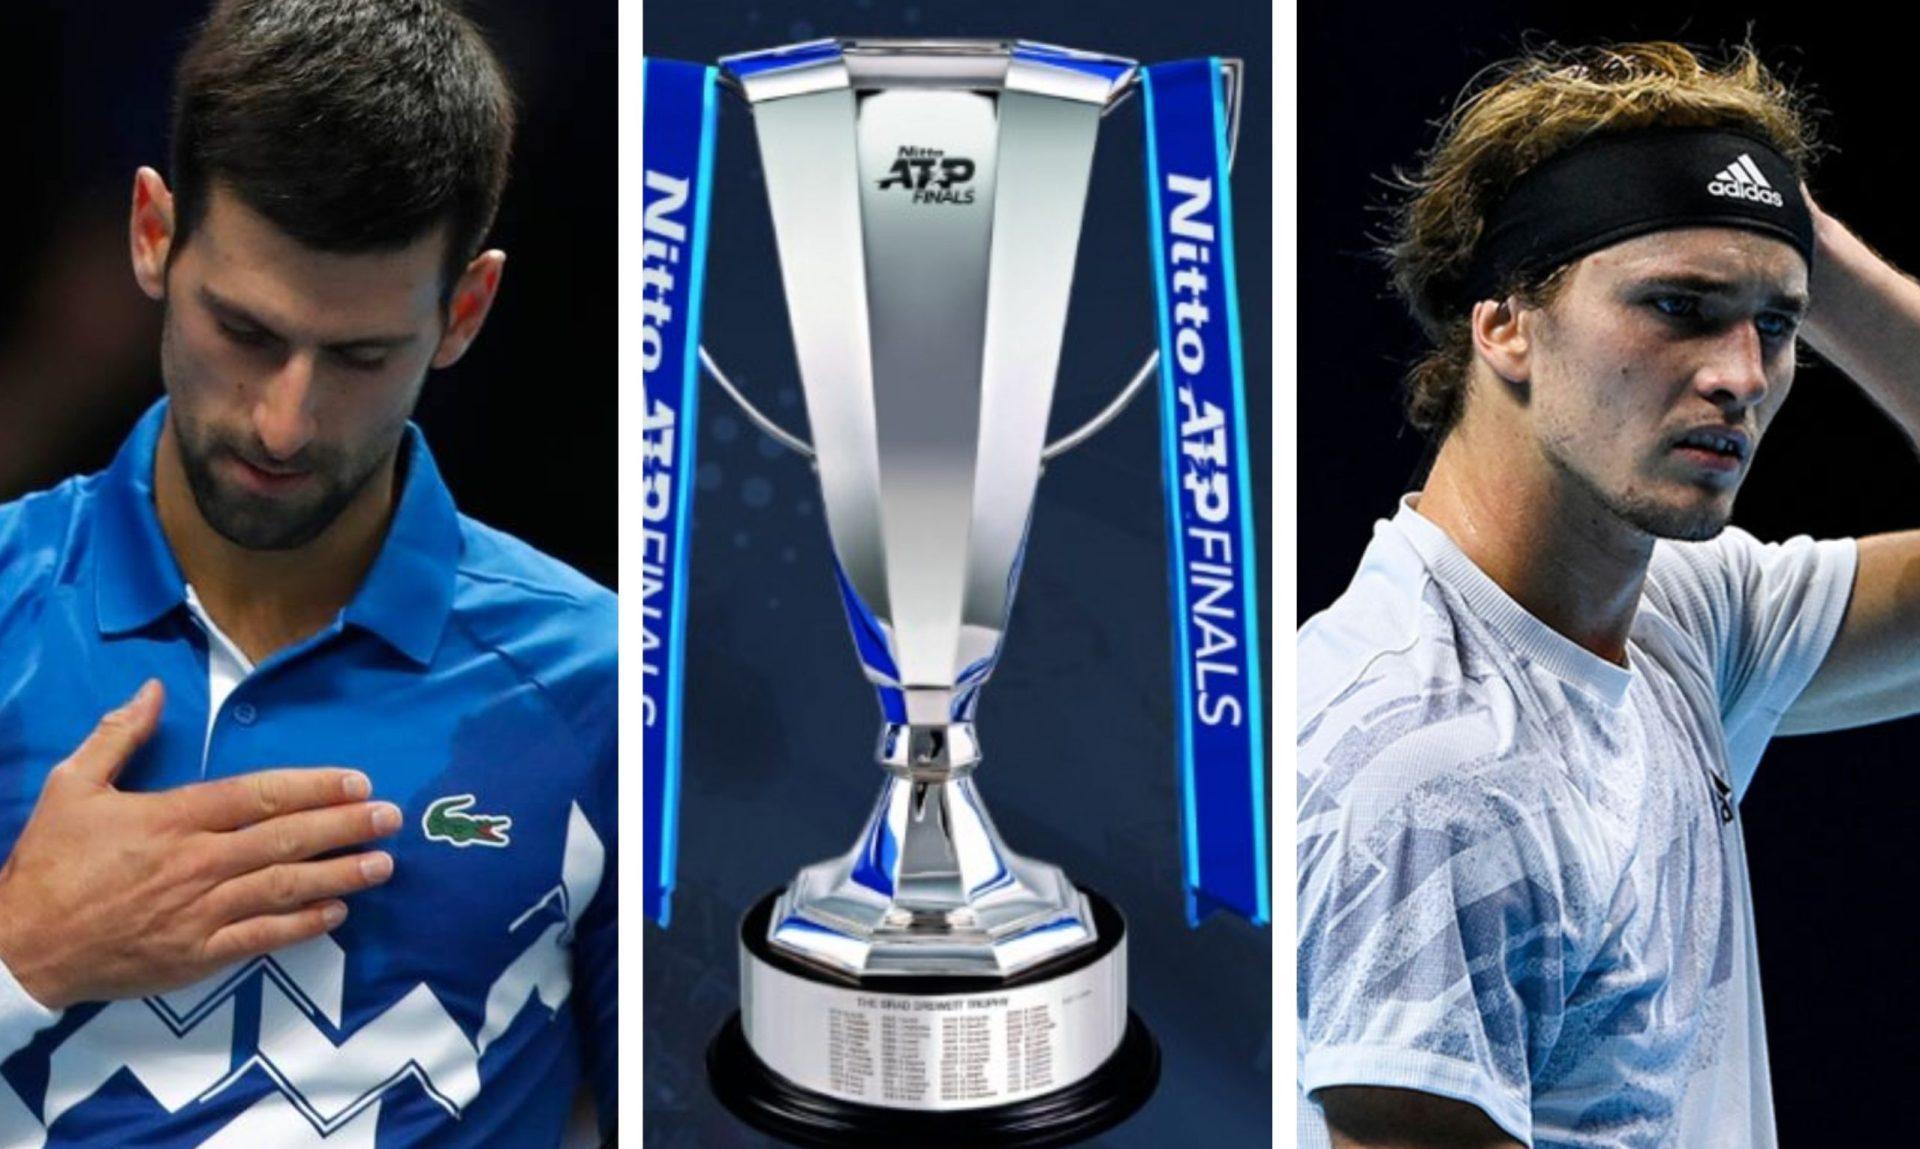 The Djoker juggernaugt-Novak Djokovic rallies past a battling Zverev in the ATP Finals - THE SPORTS ROOM